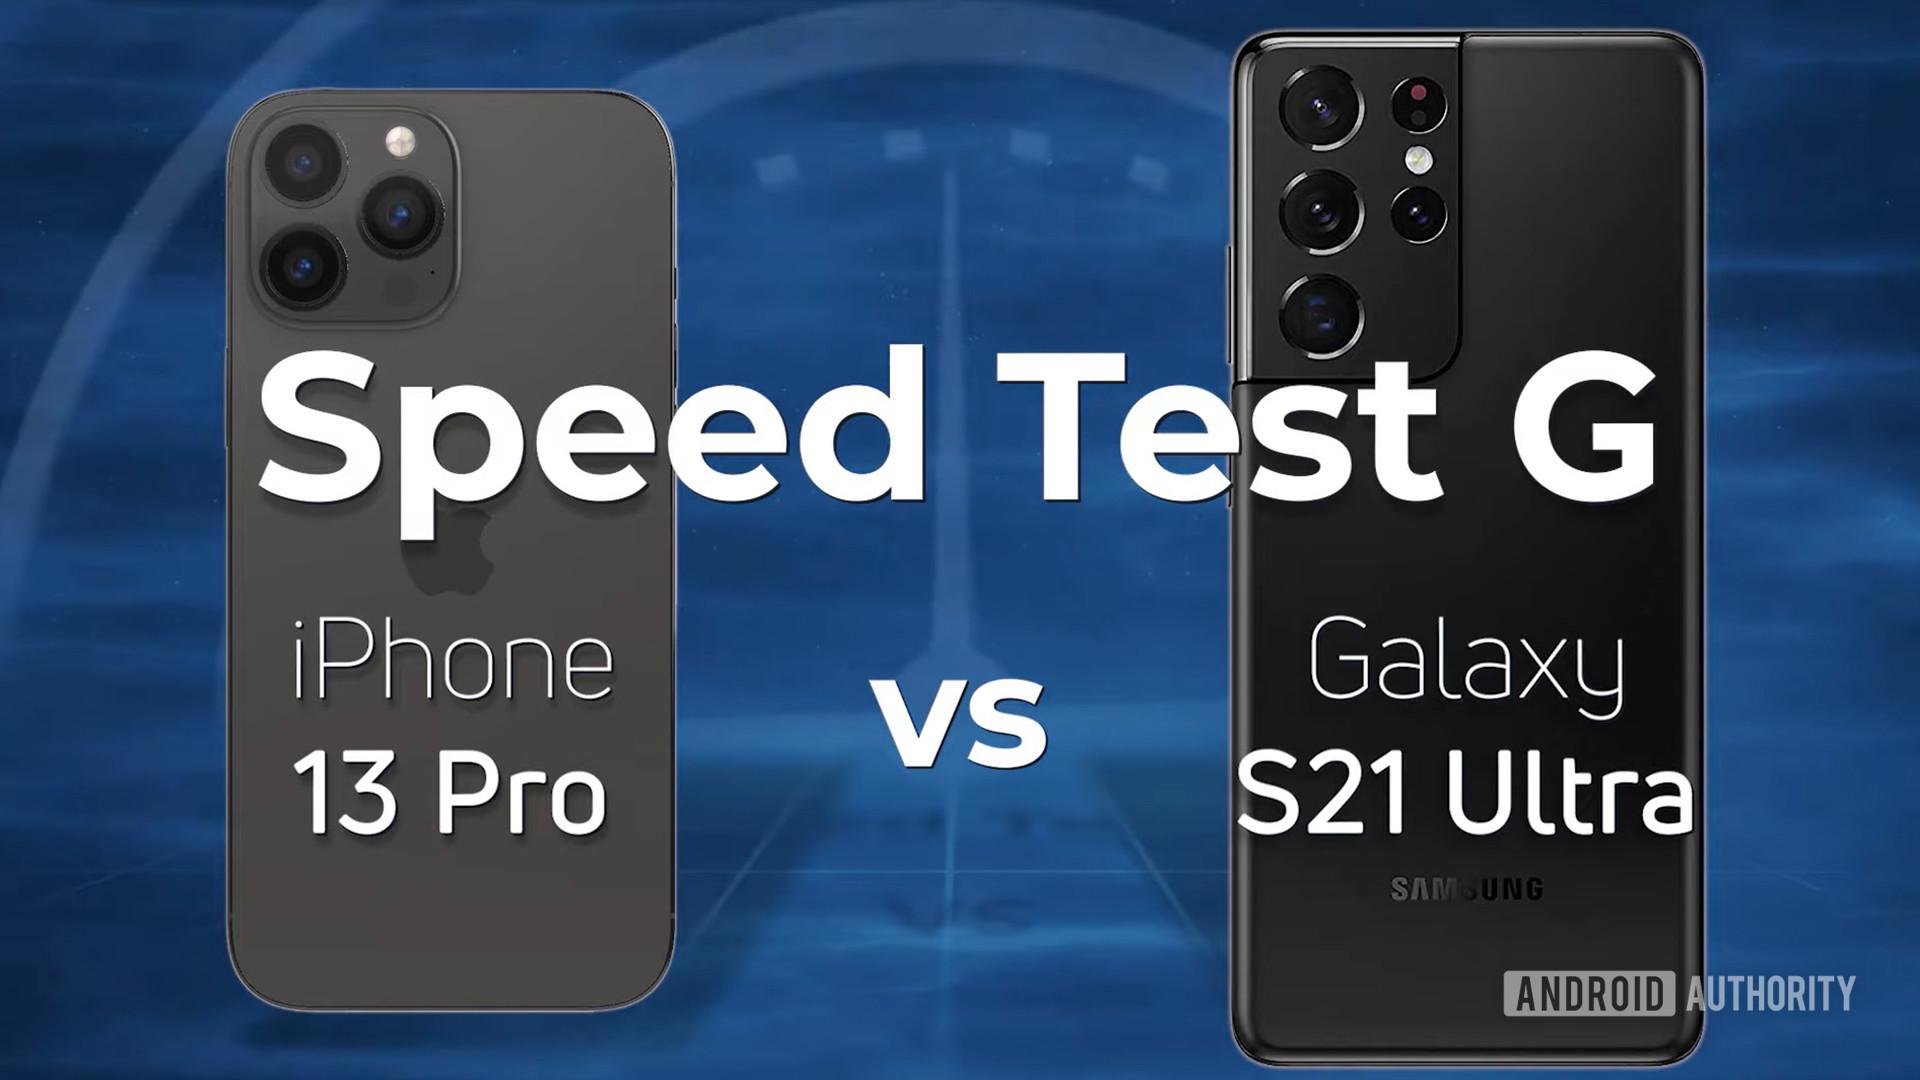 iPhone 13 Pro vs Samsung Galaxy S21 Ultra